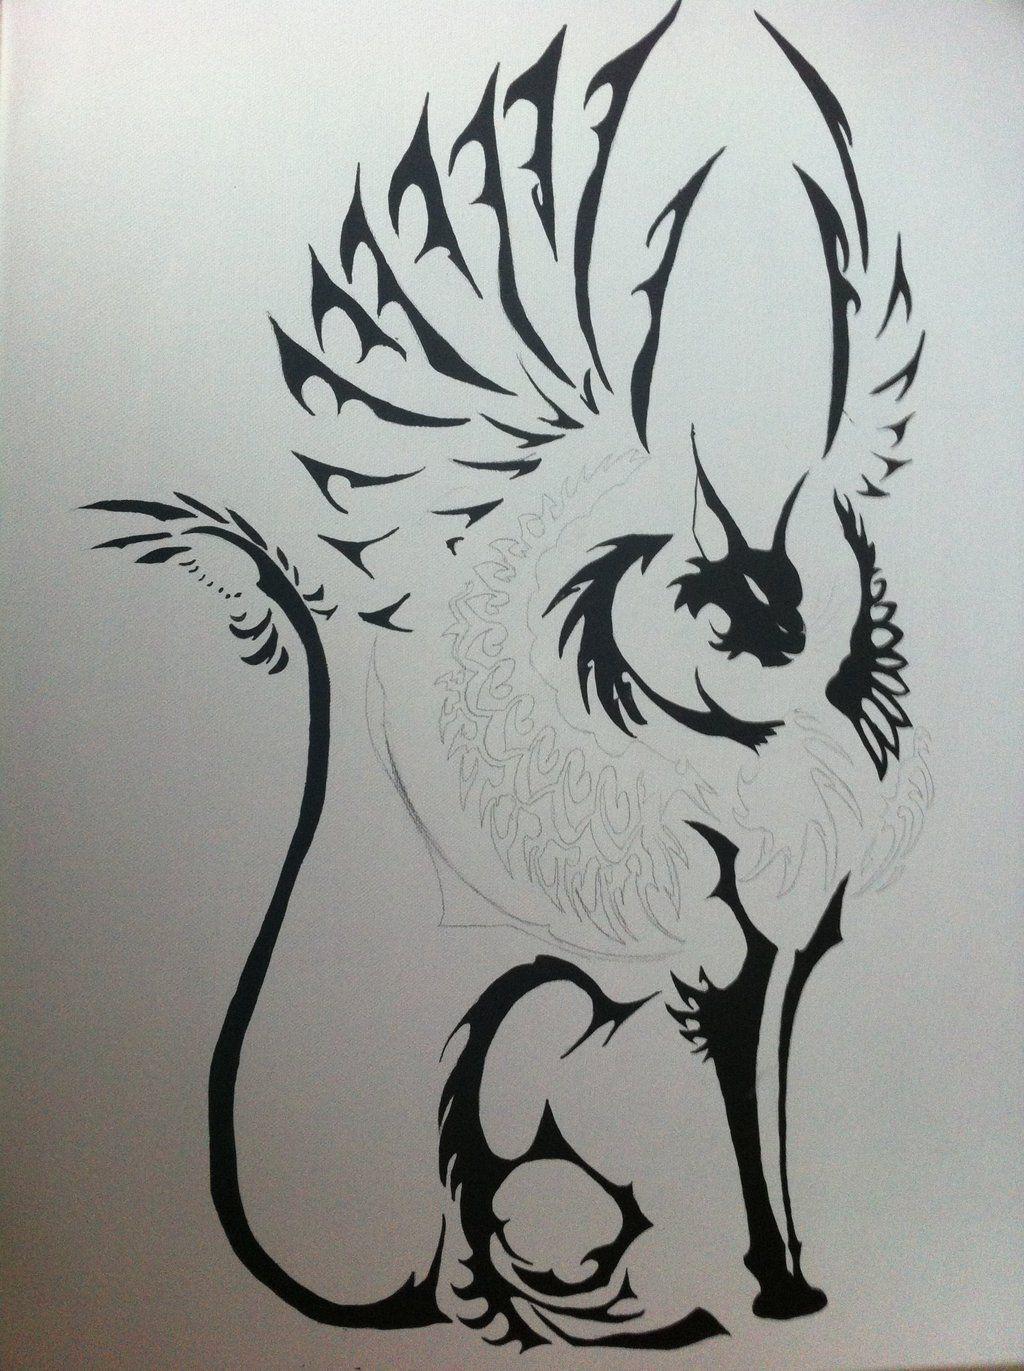 Cat With Wings Art Imgbucket Com Bucket List In Pictures Wings Art Art Dragon Wings